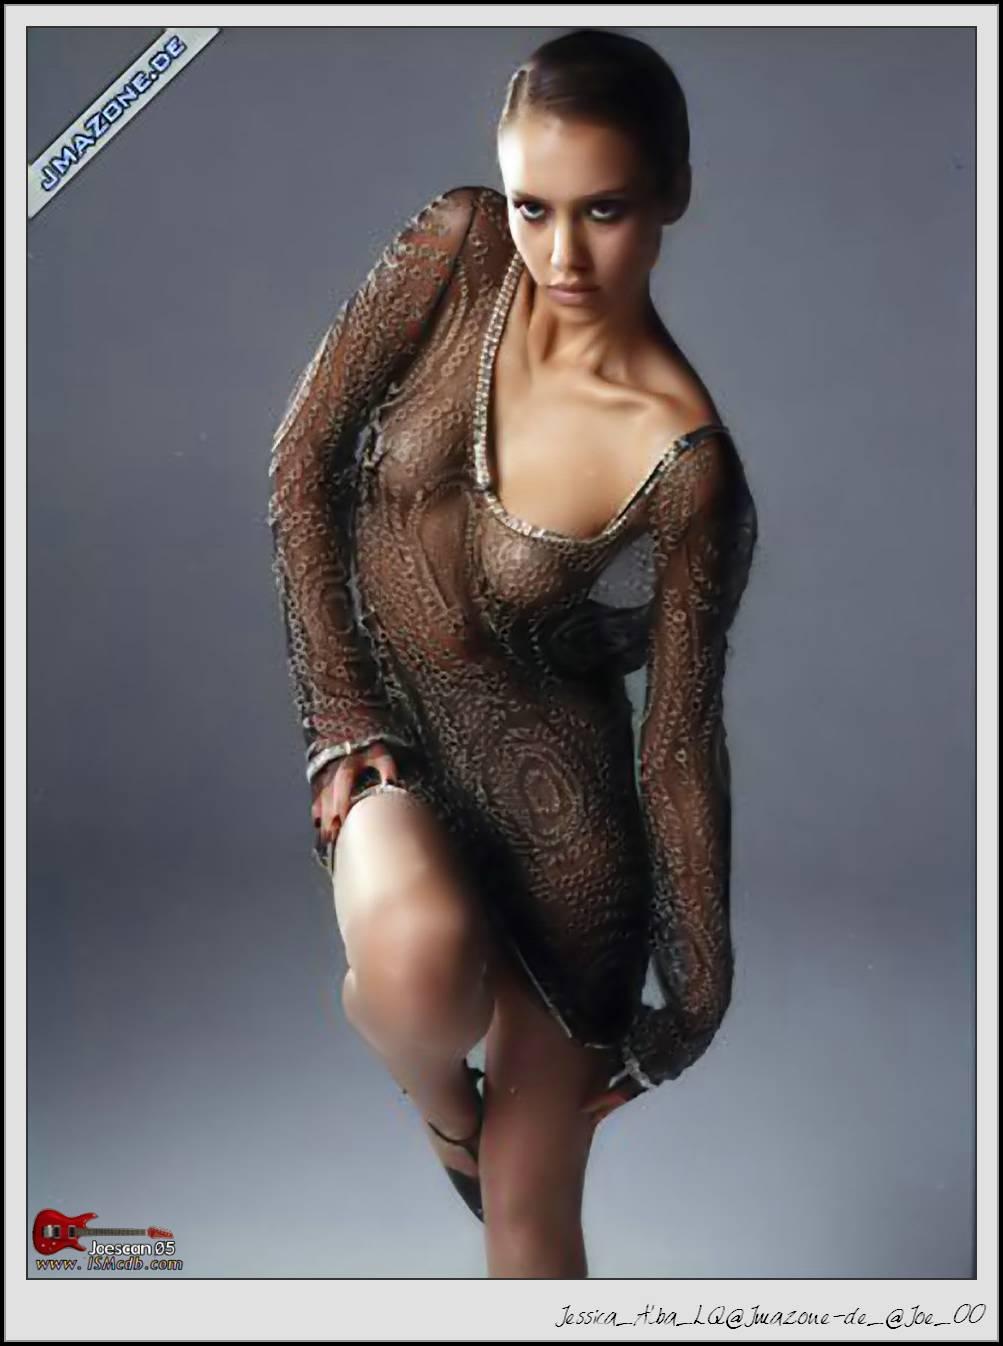 alba shoot Jessica naked photo